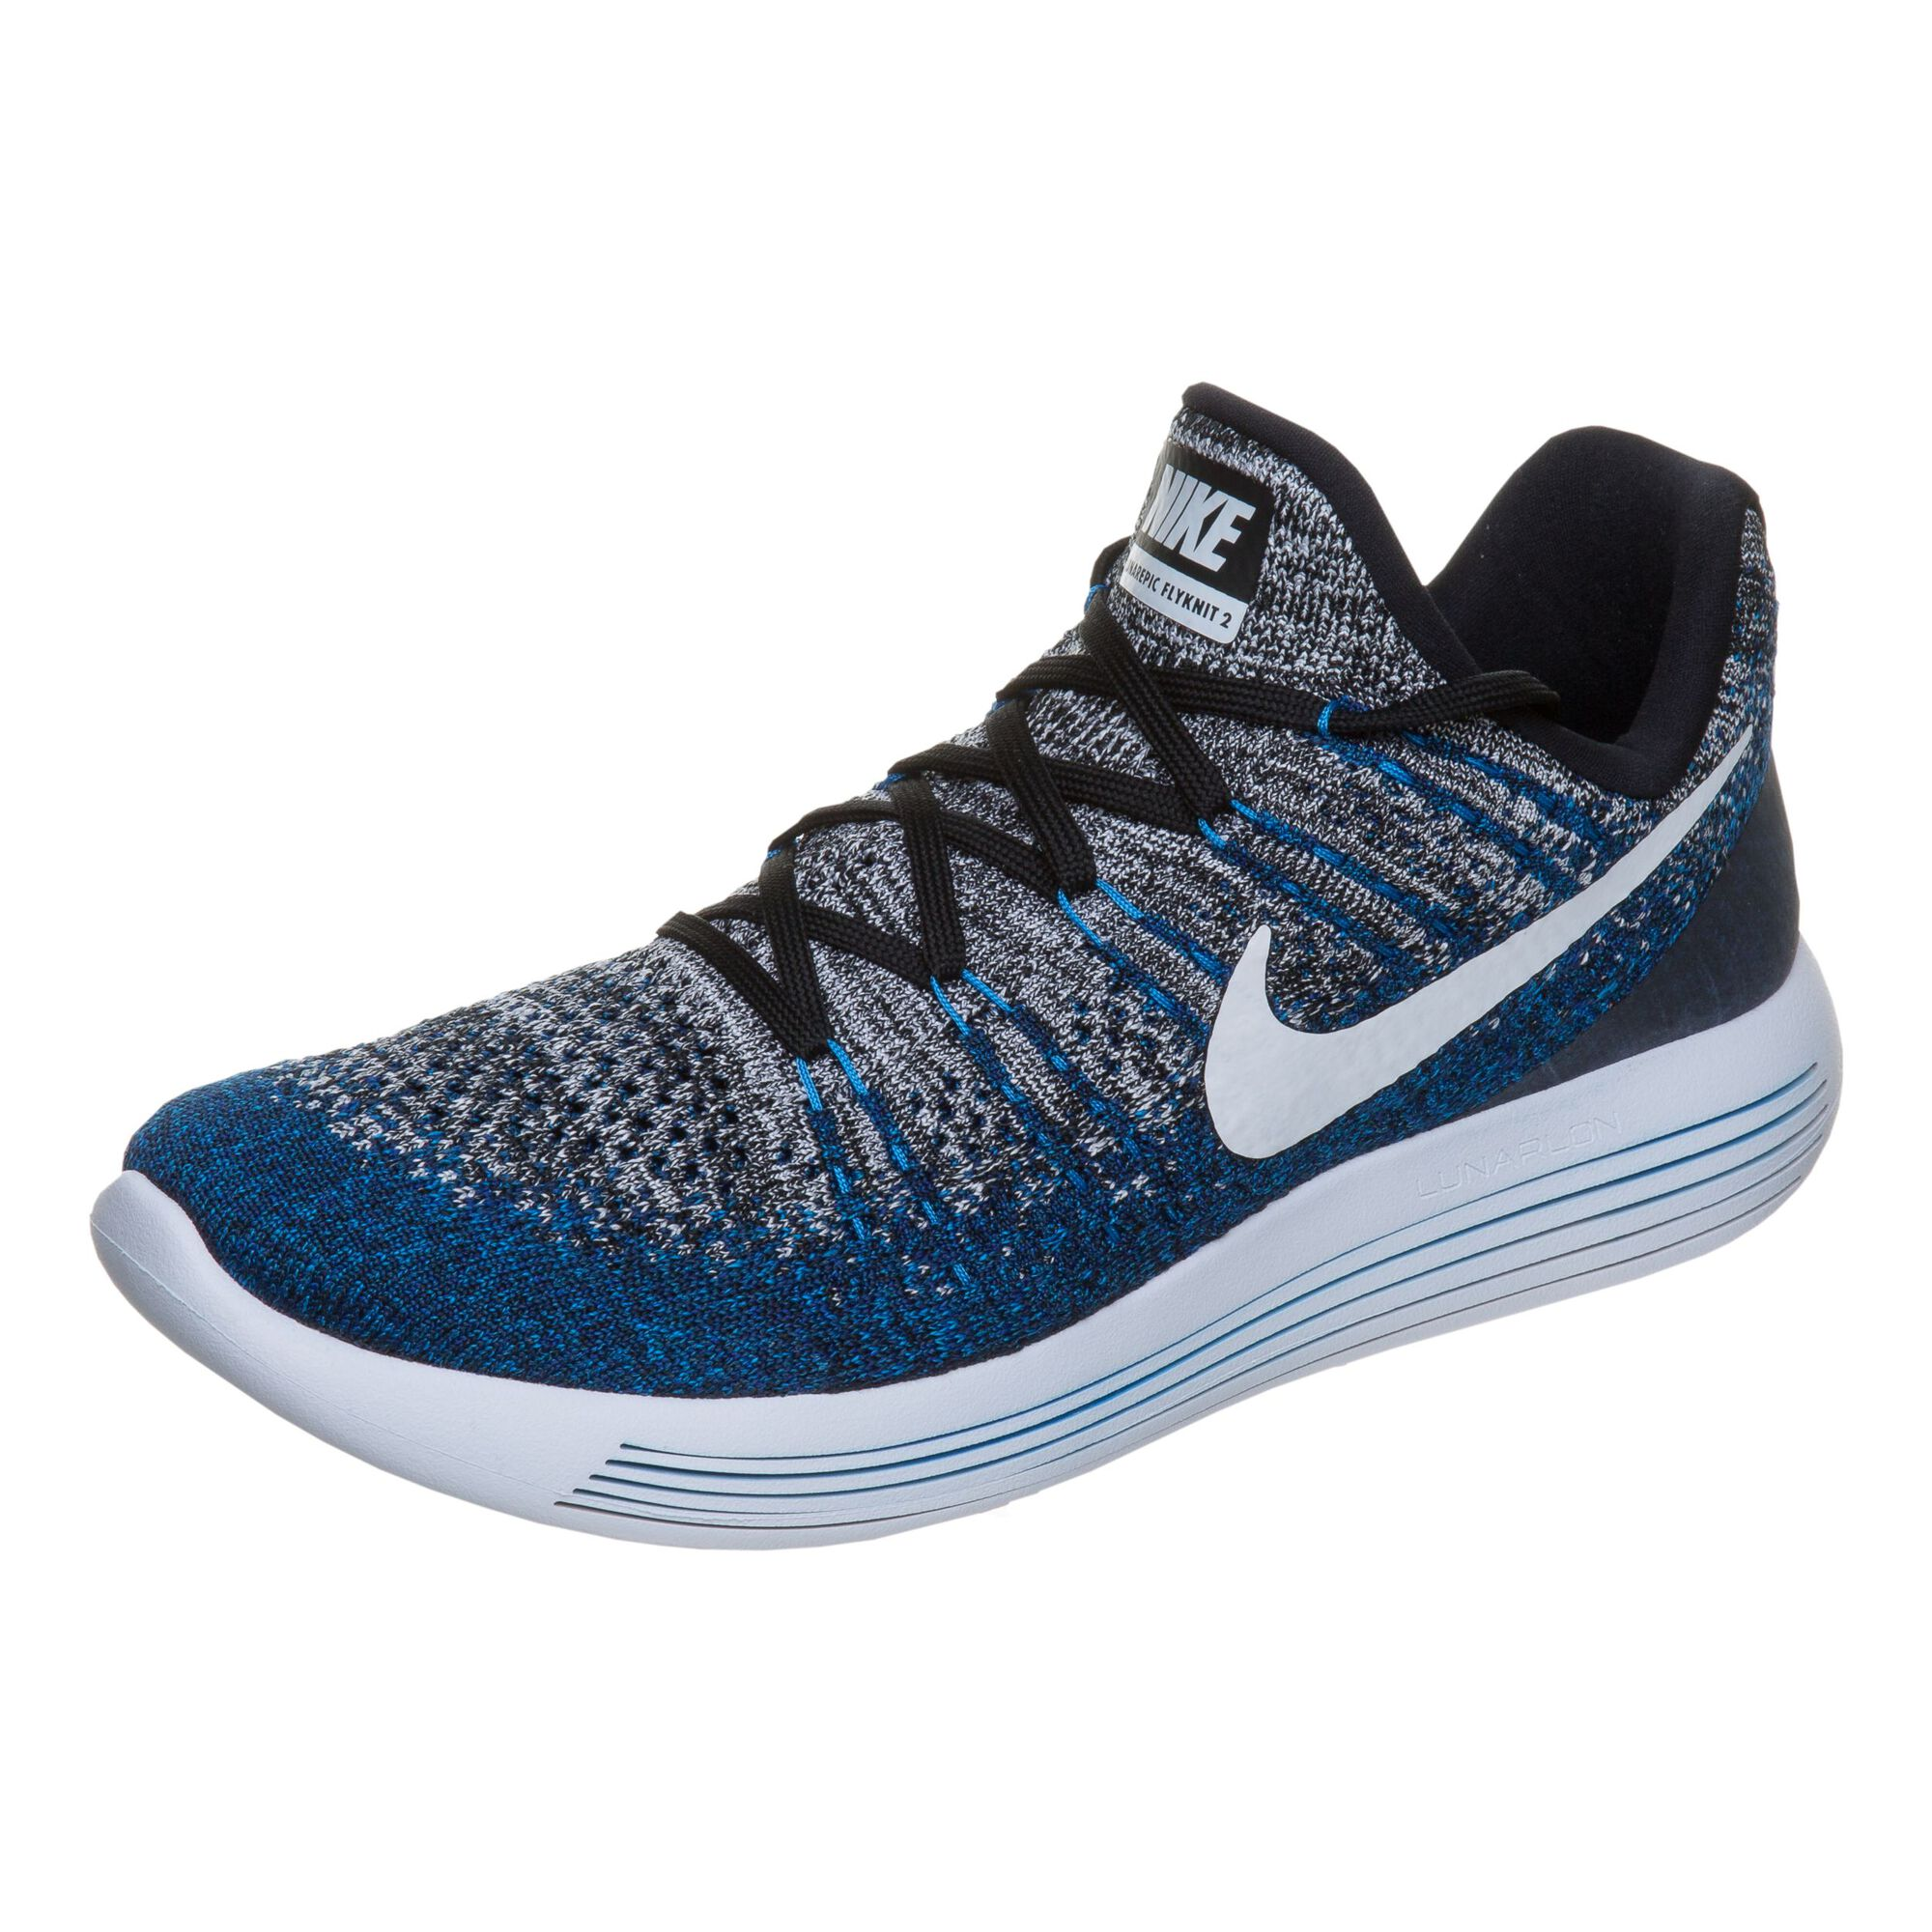 de8cc0edb779 buy Nike LunarEpic Flyknit 2 Neutral Running Shoe Men - Black